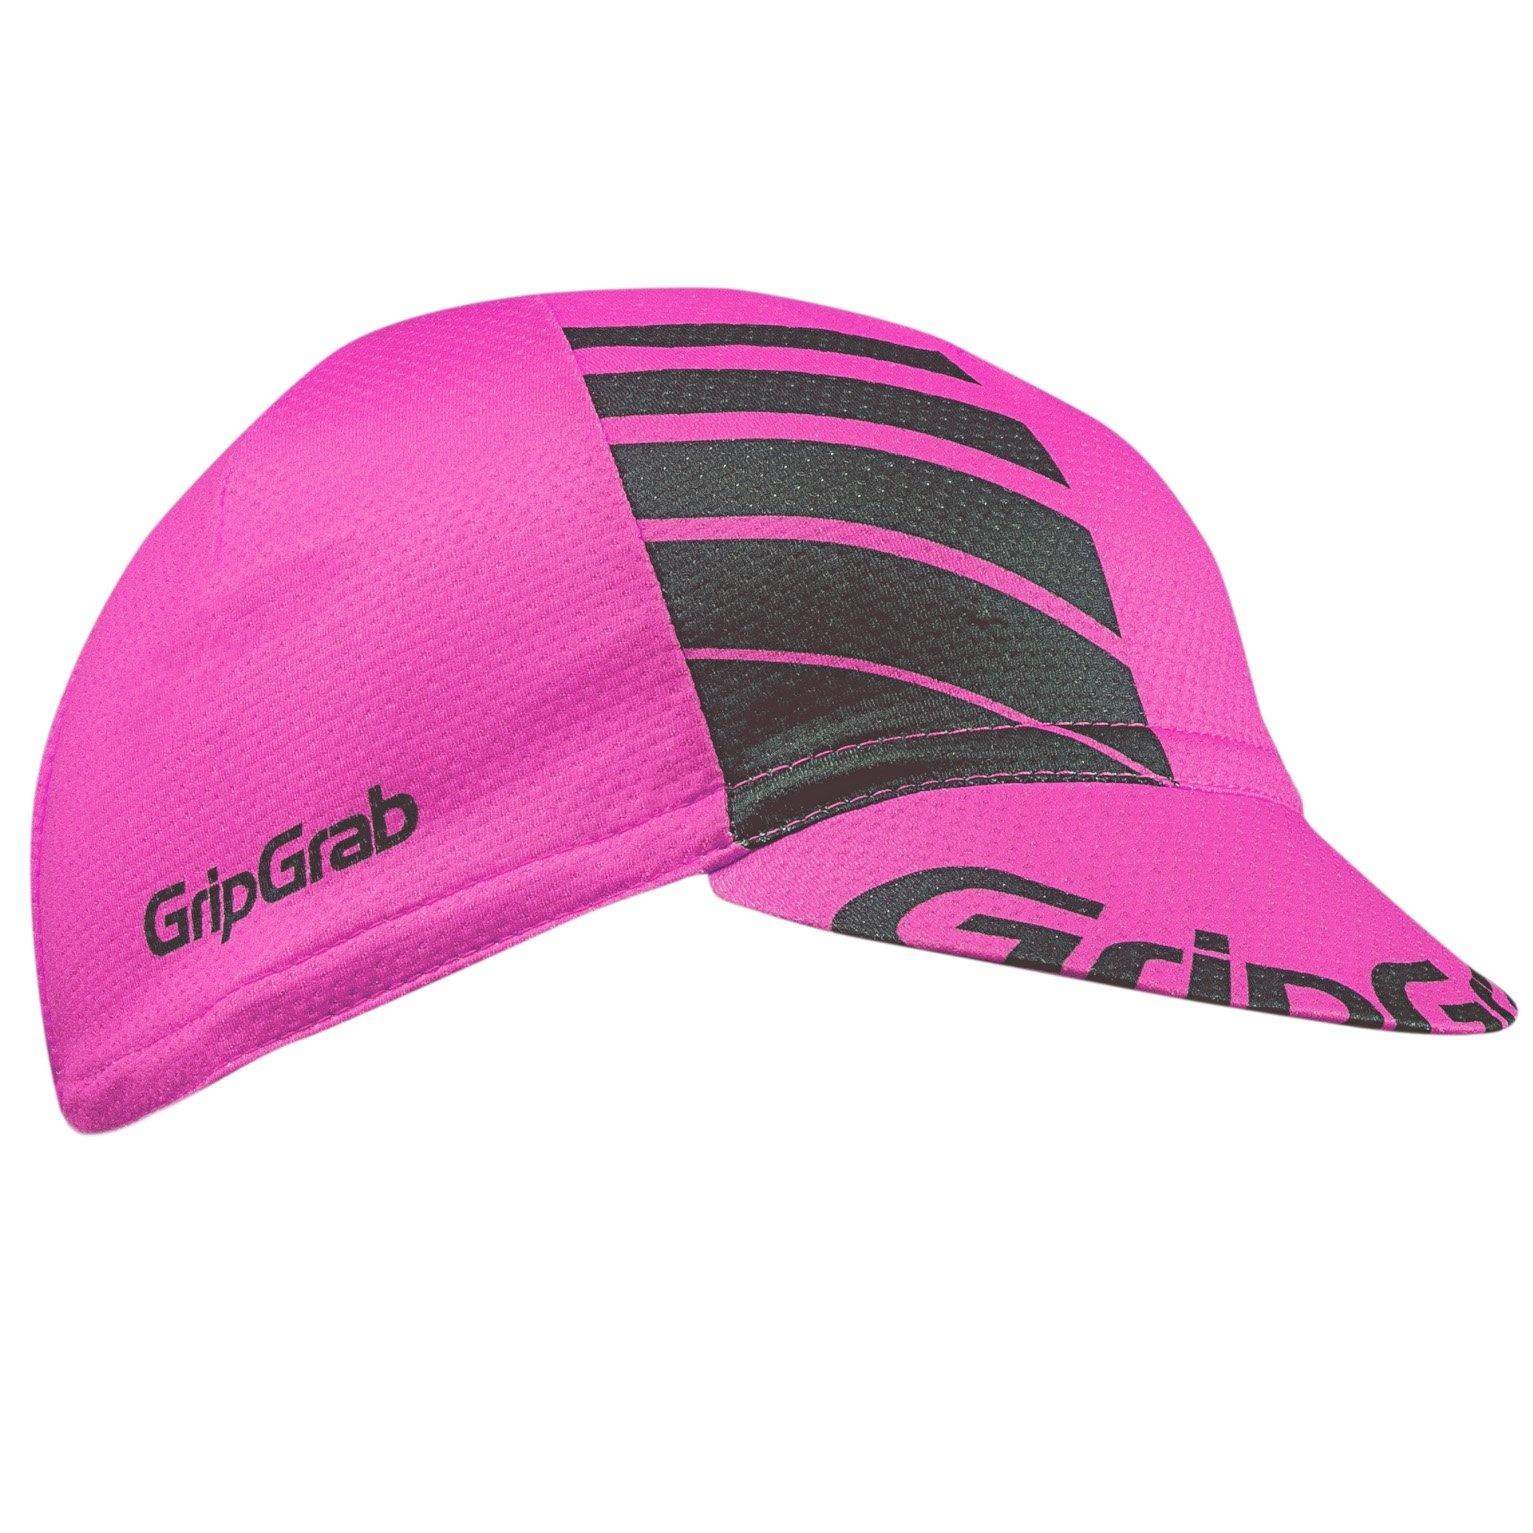 GripGrab Summer Cycling Cap Letvægts - Pink